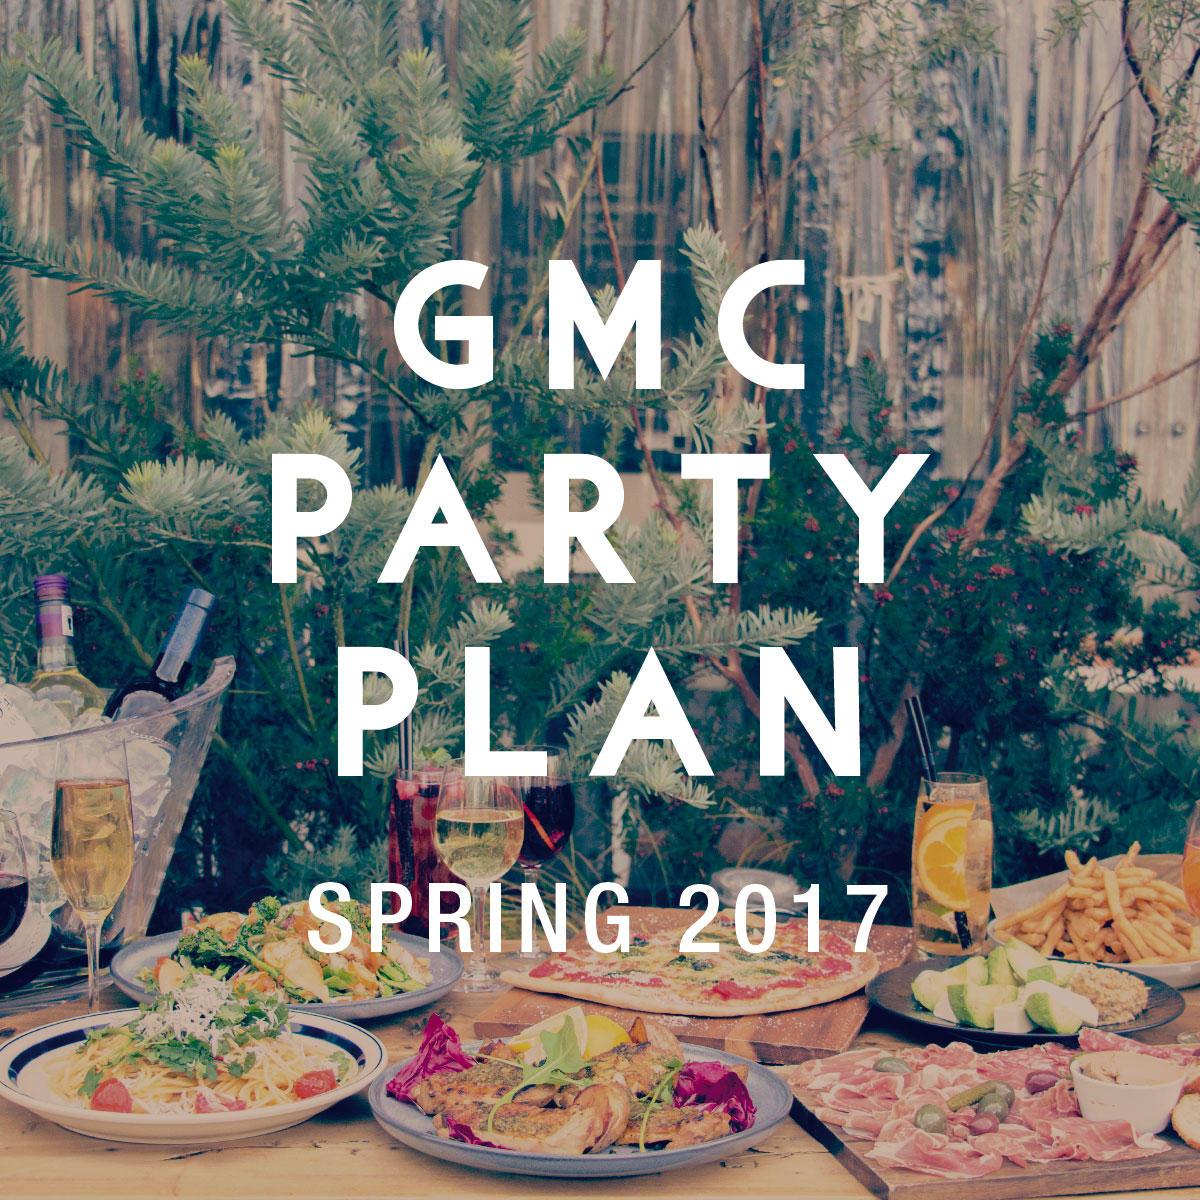 GMC原宿 春のパーティープラン!歓送迎会に!!